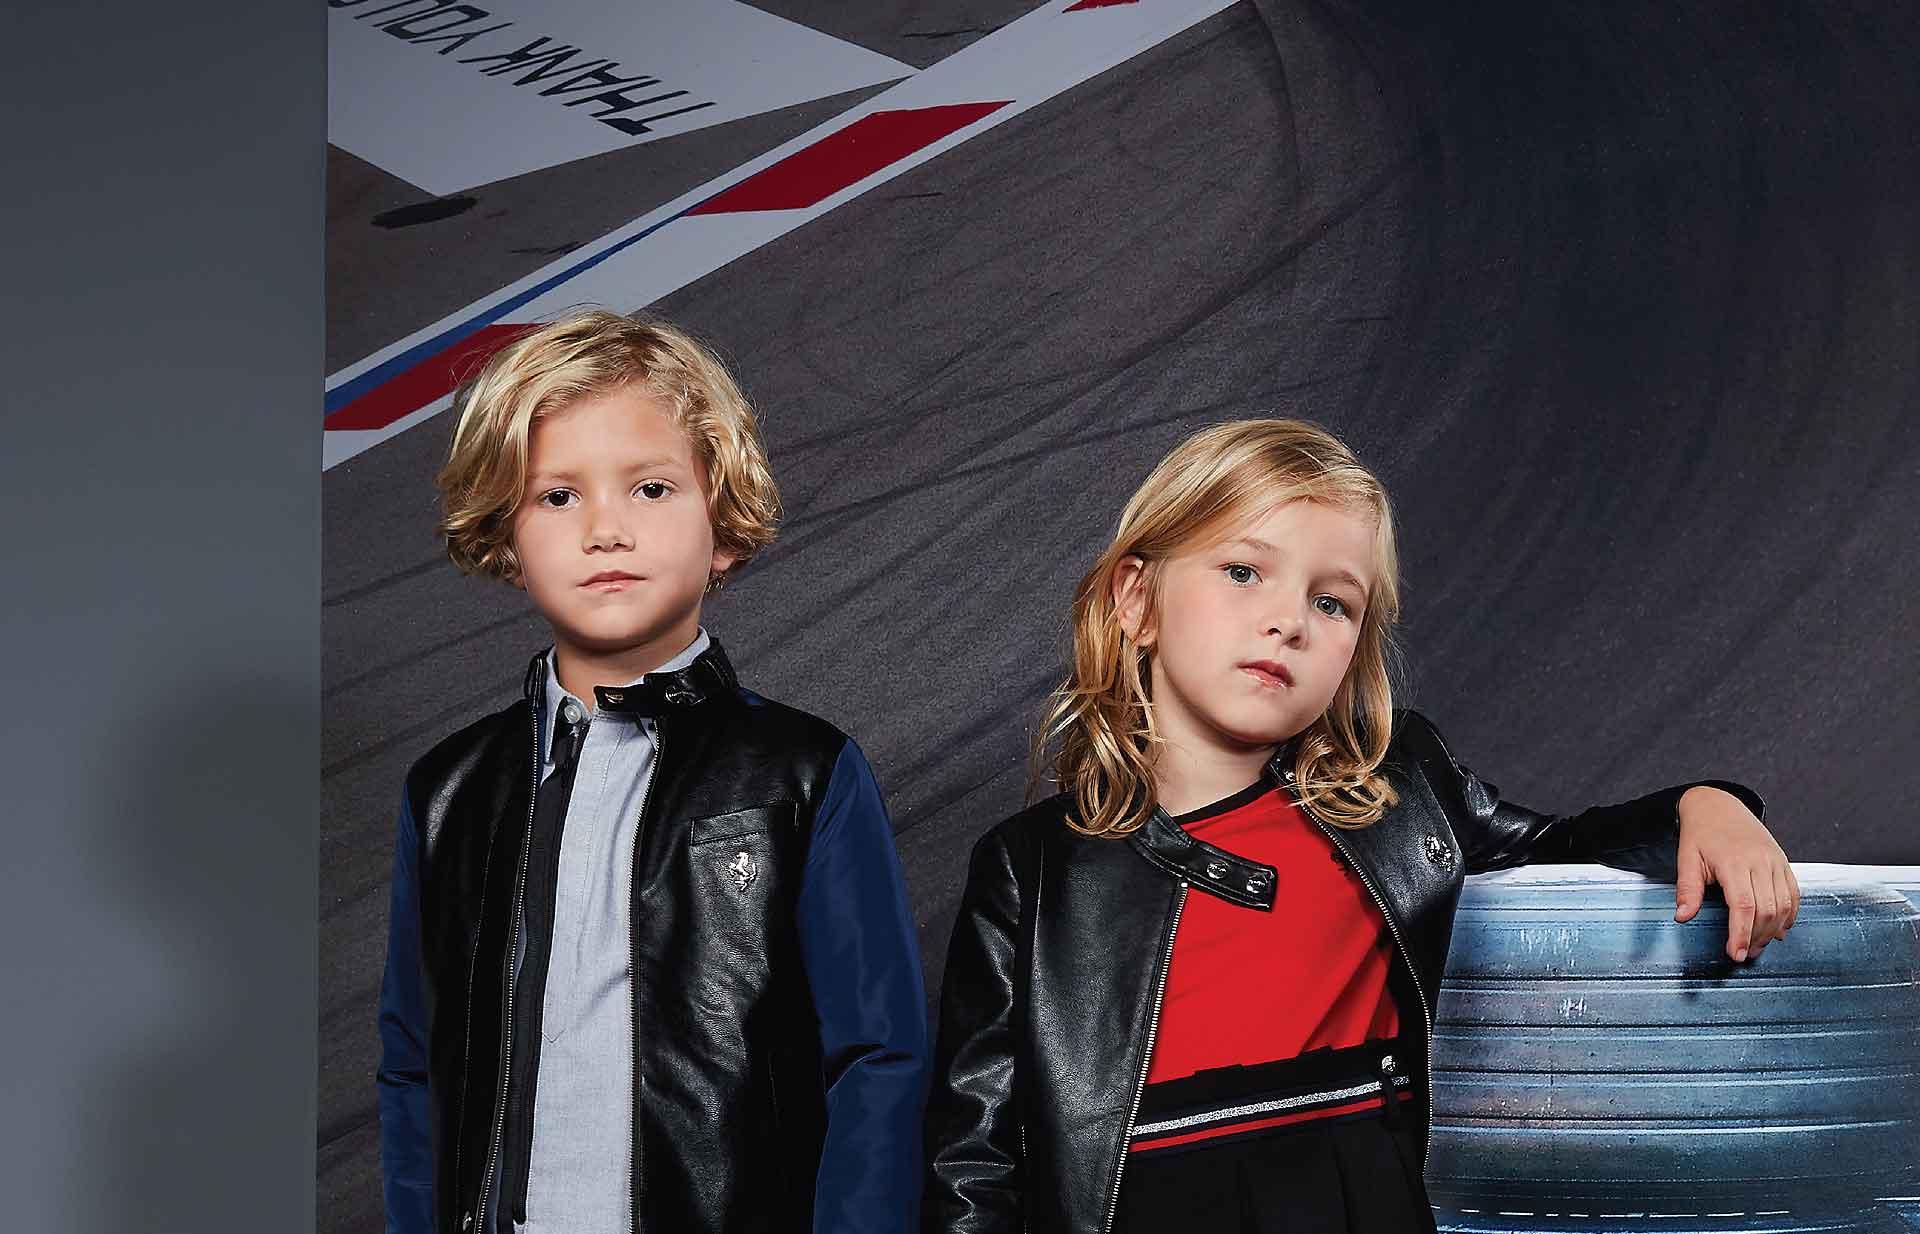 Ferrari Store Junior Ferrari Store Junior 03f582c63